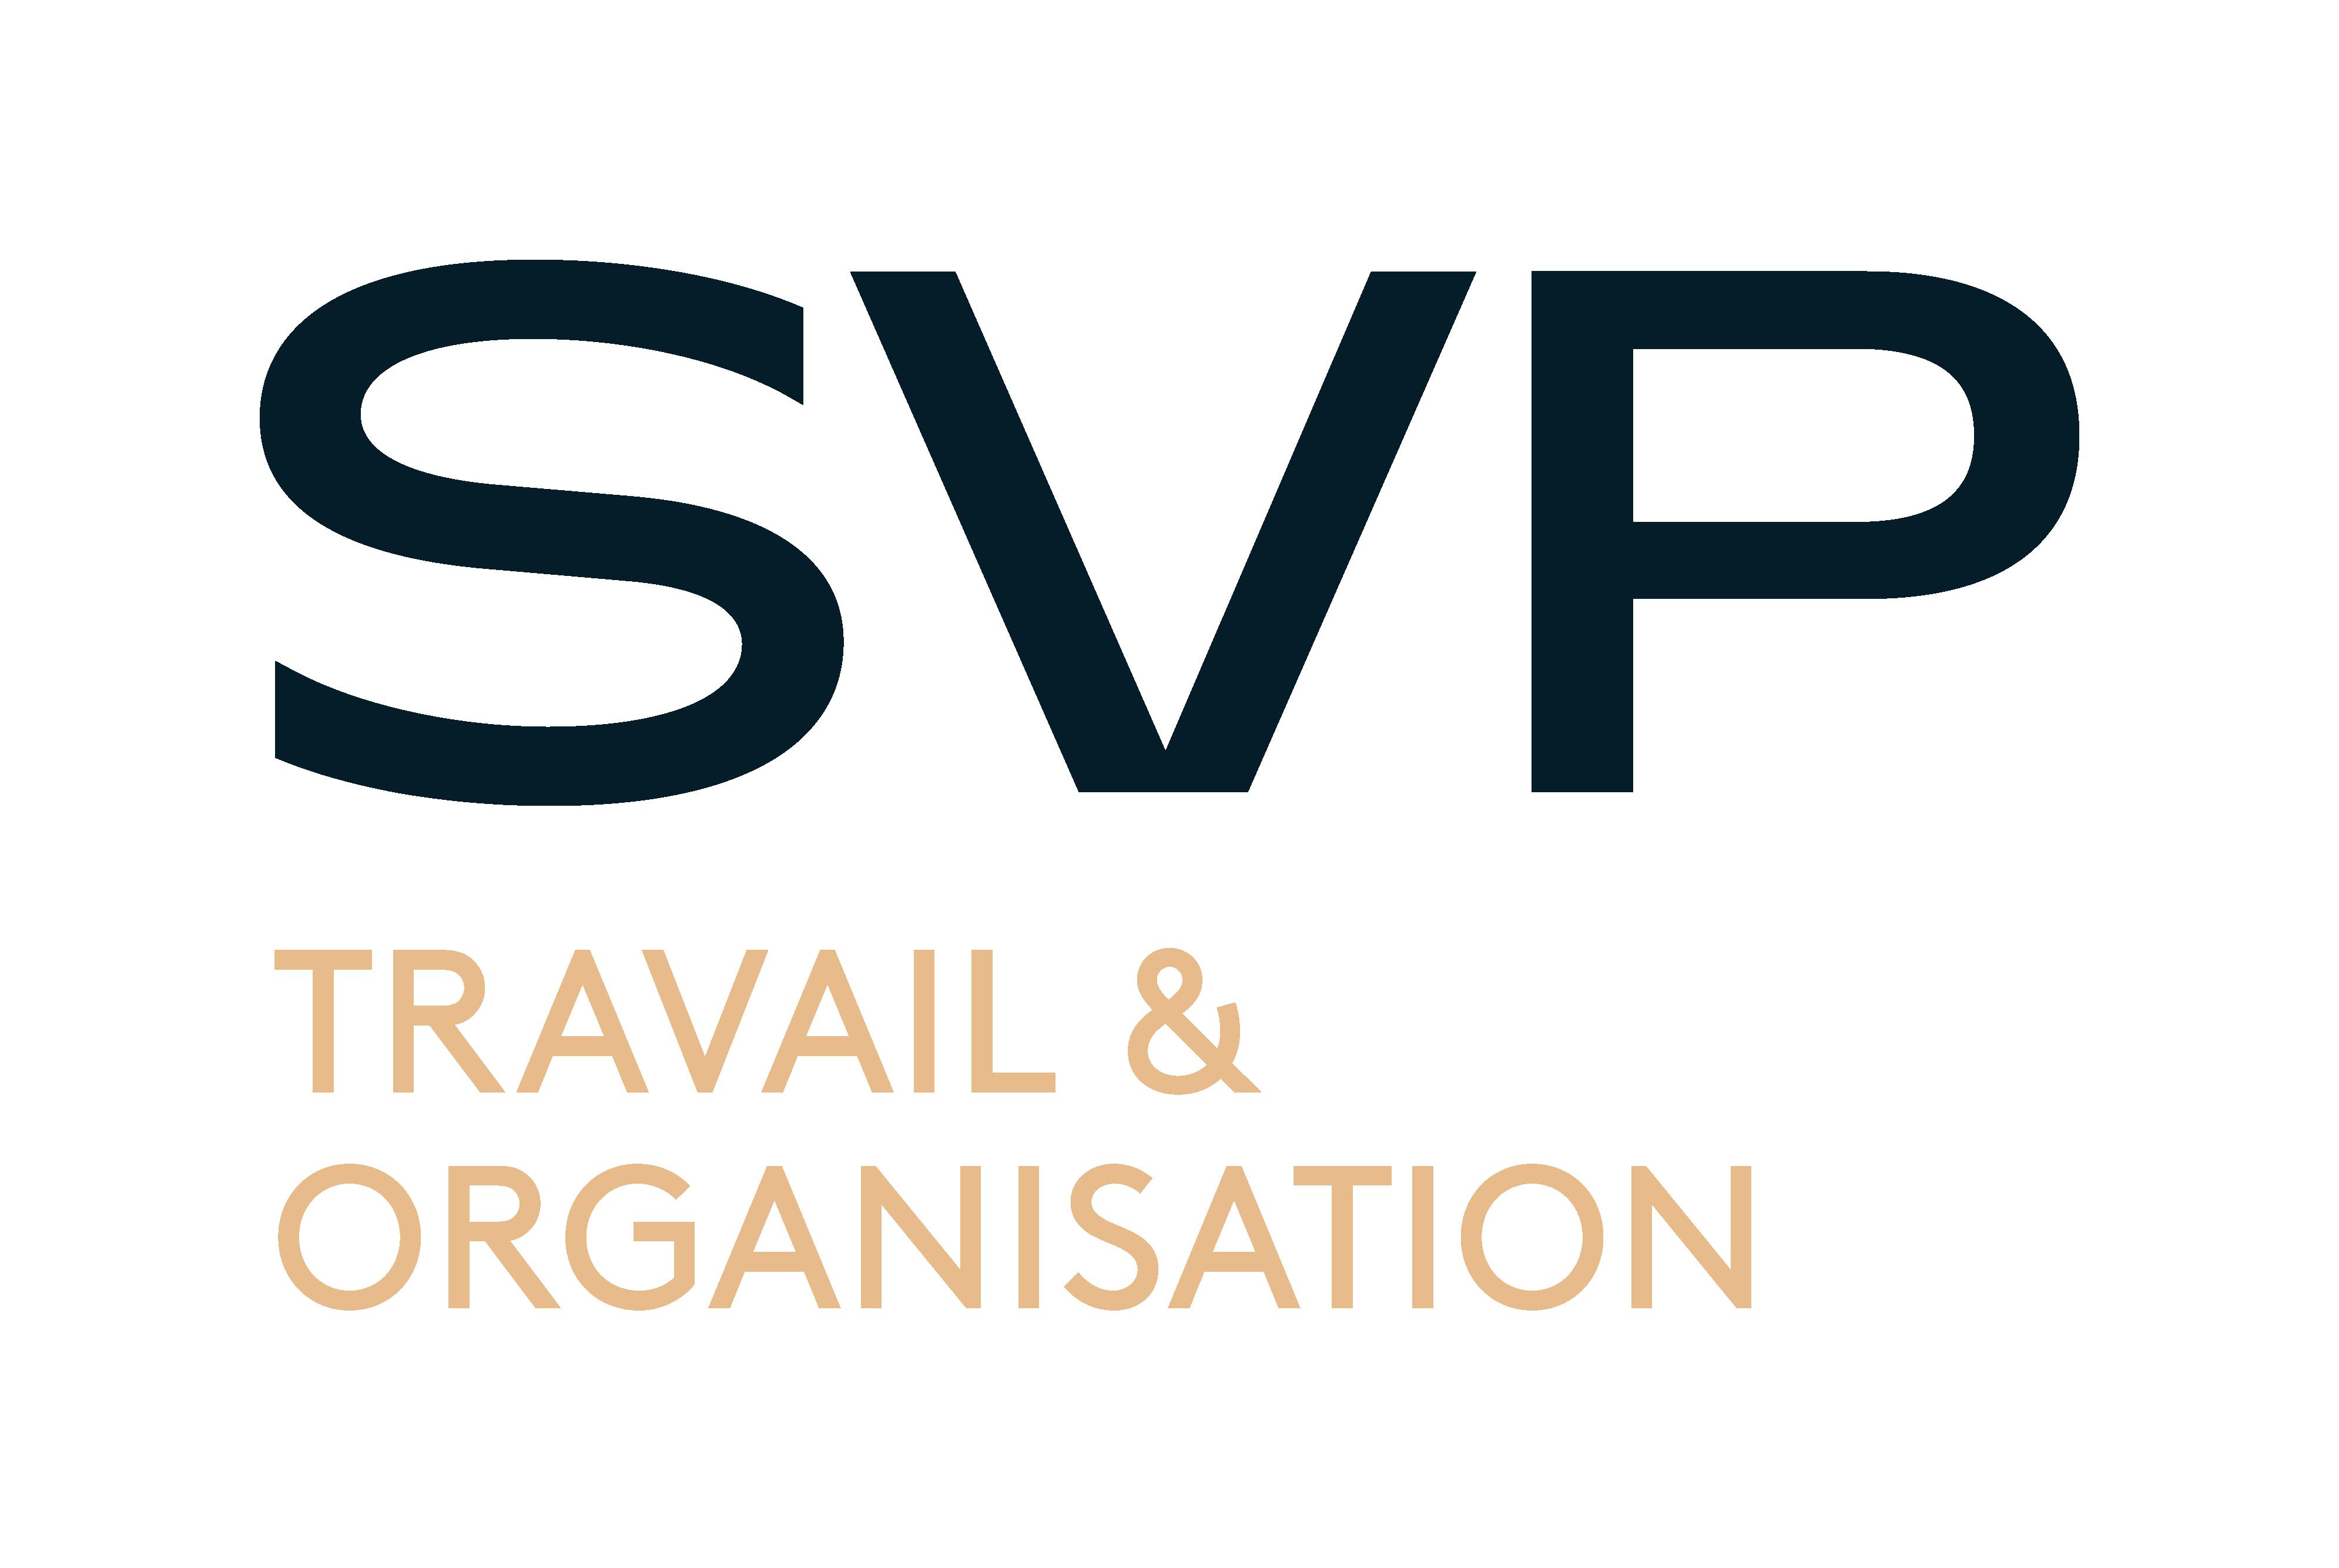 Centre SVP Travail & Organisation  - Niort (79)